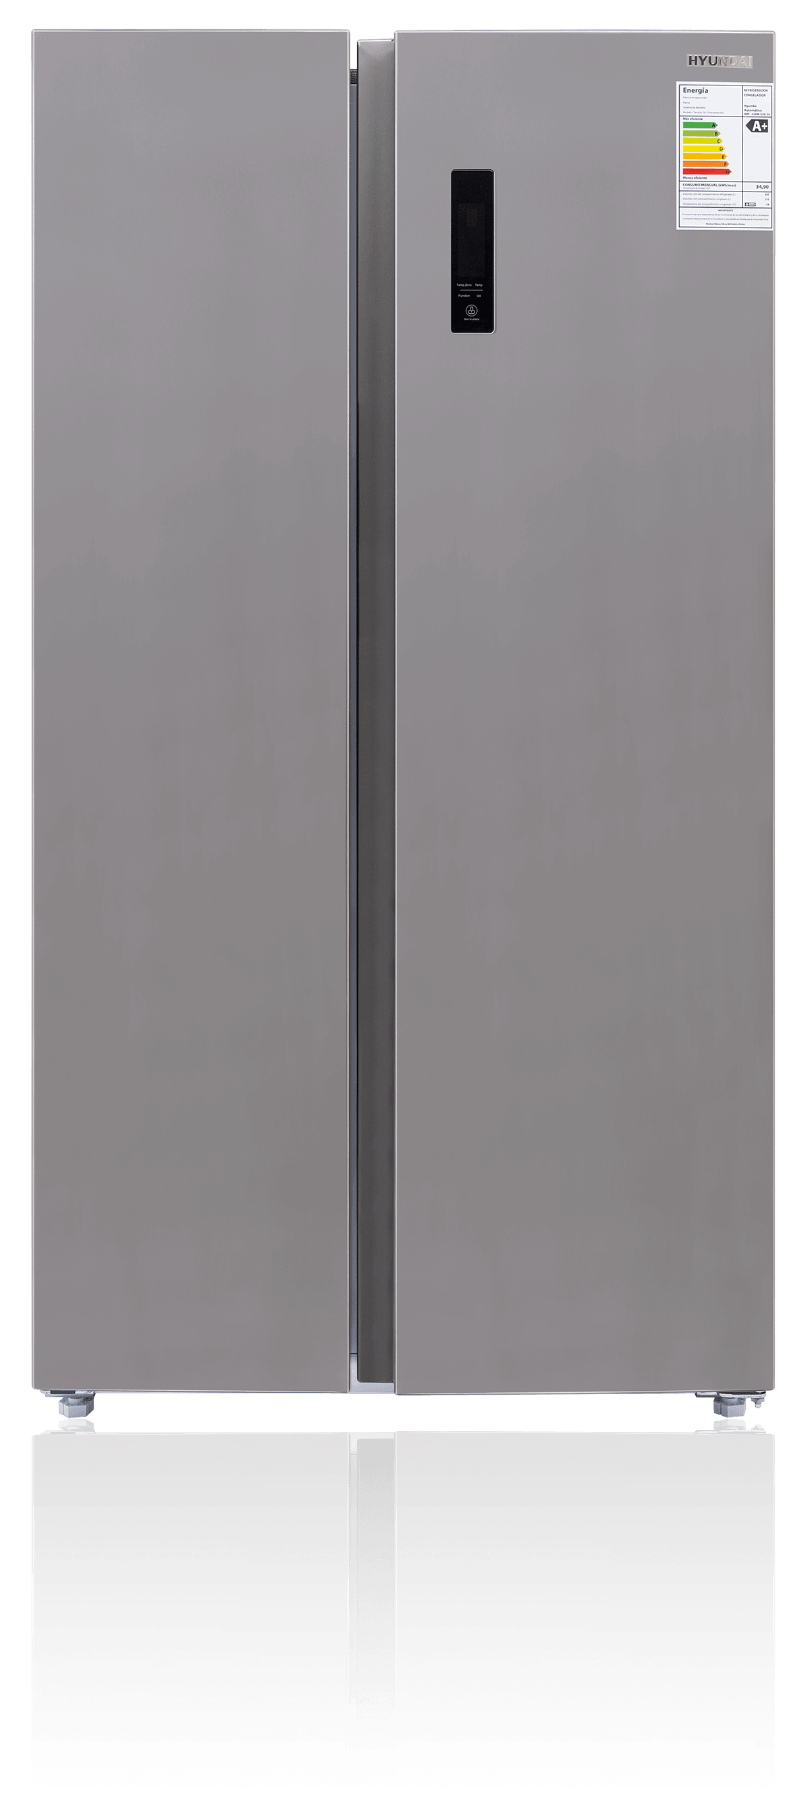 MRF-265WD